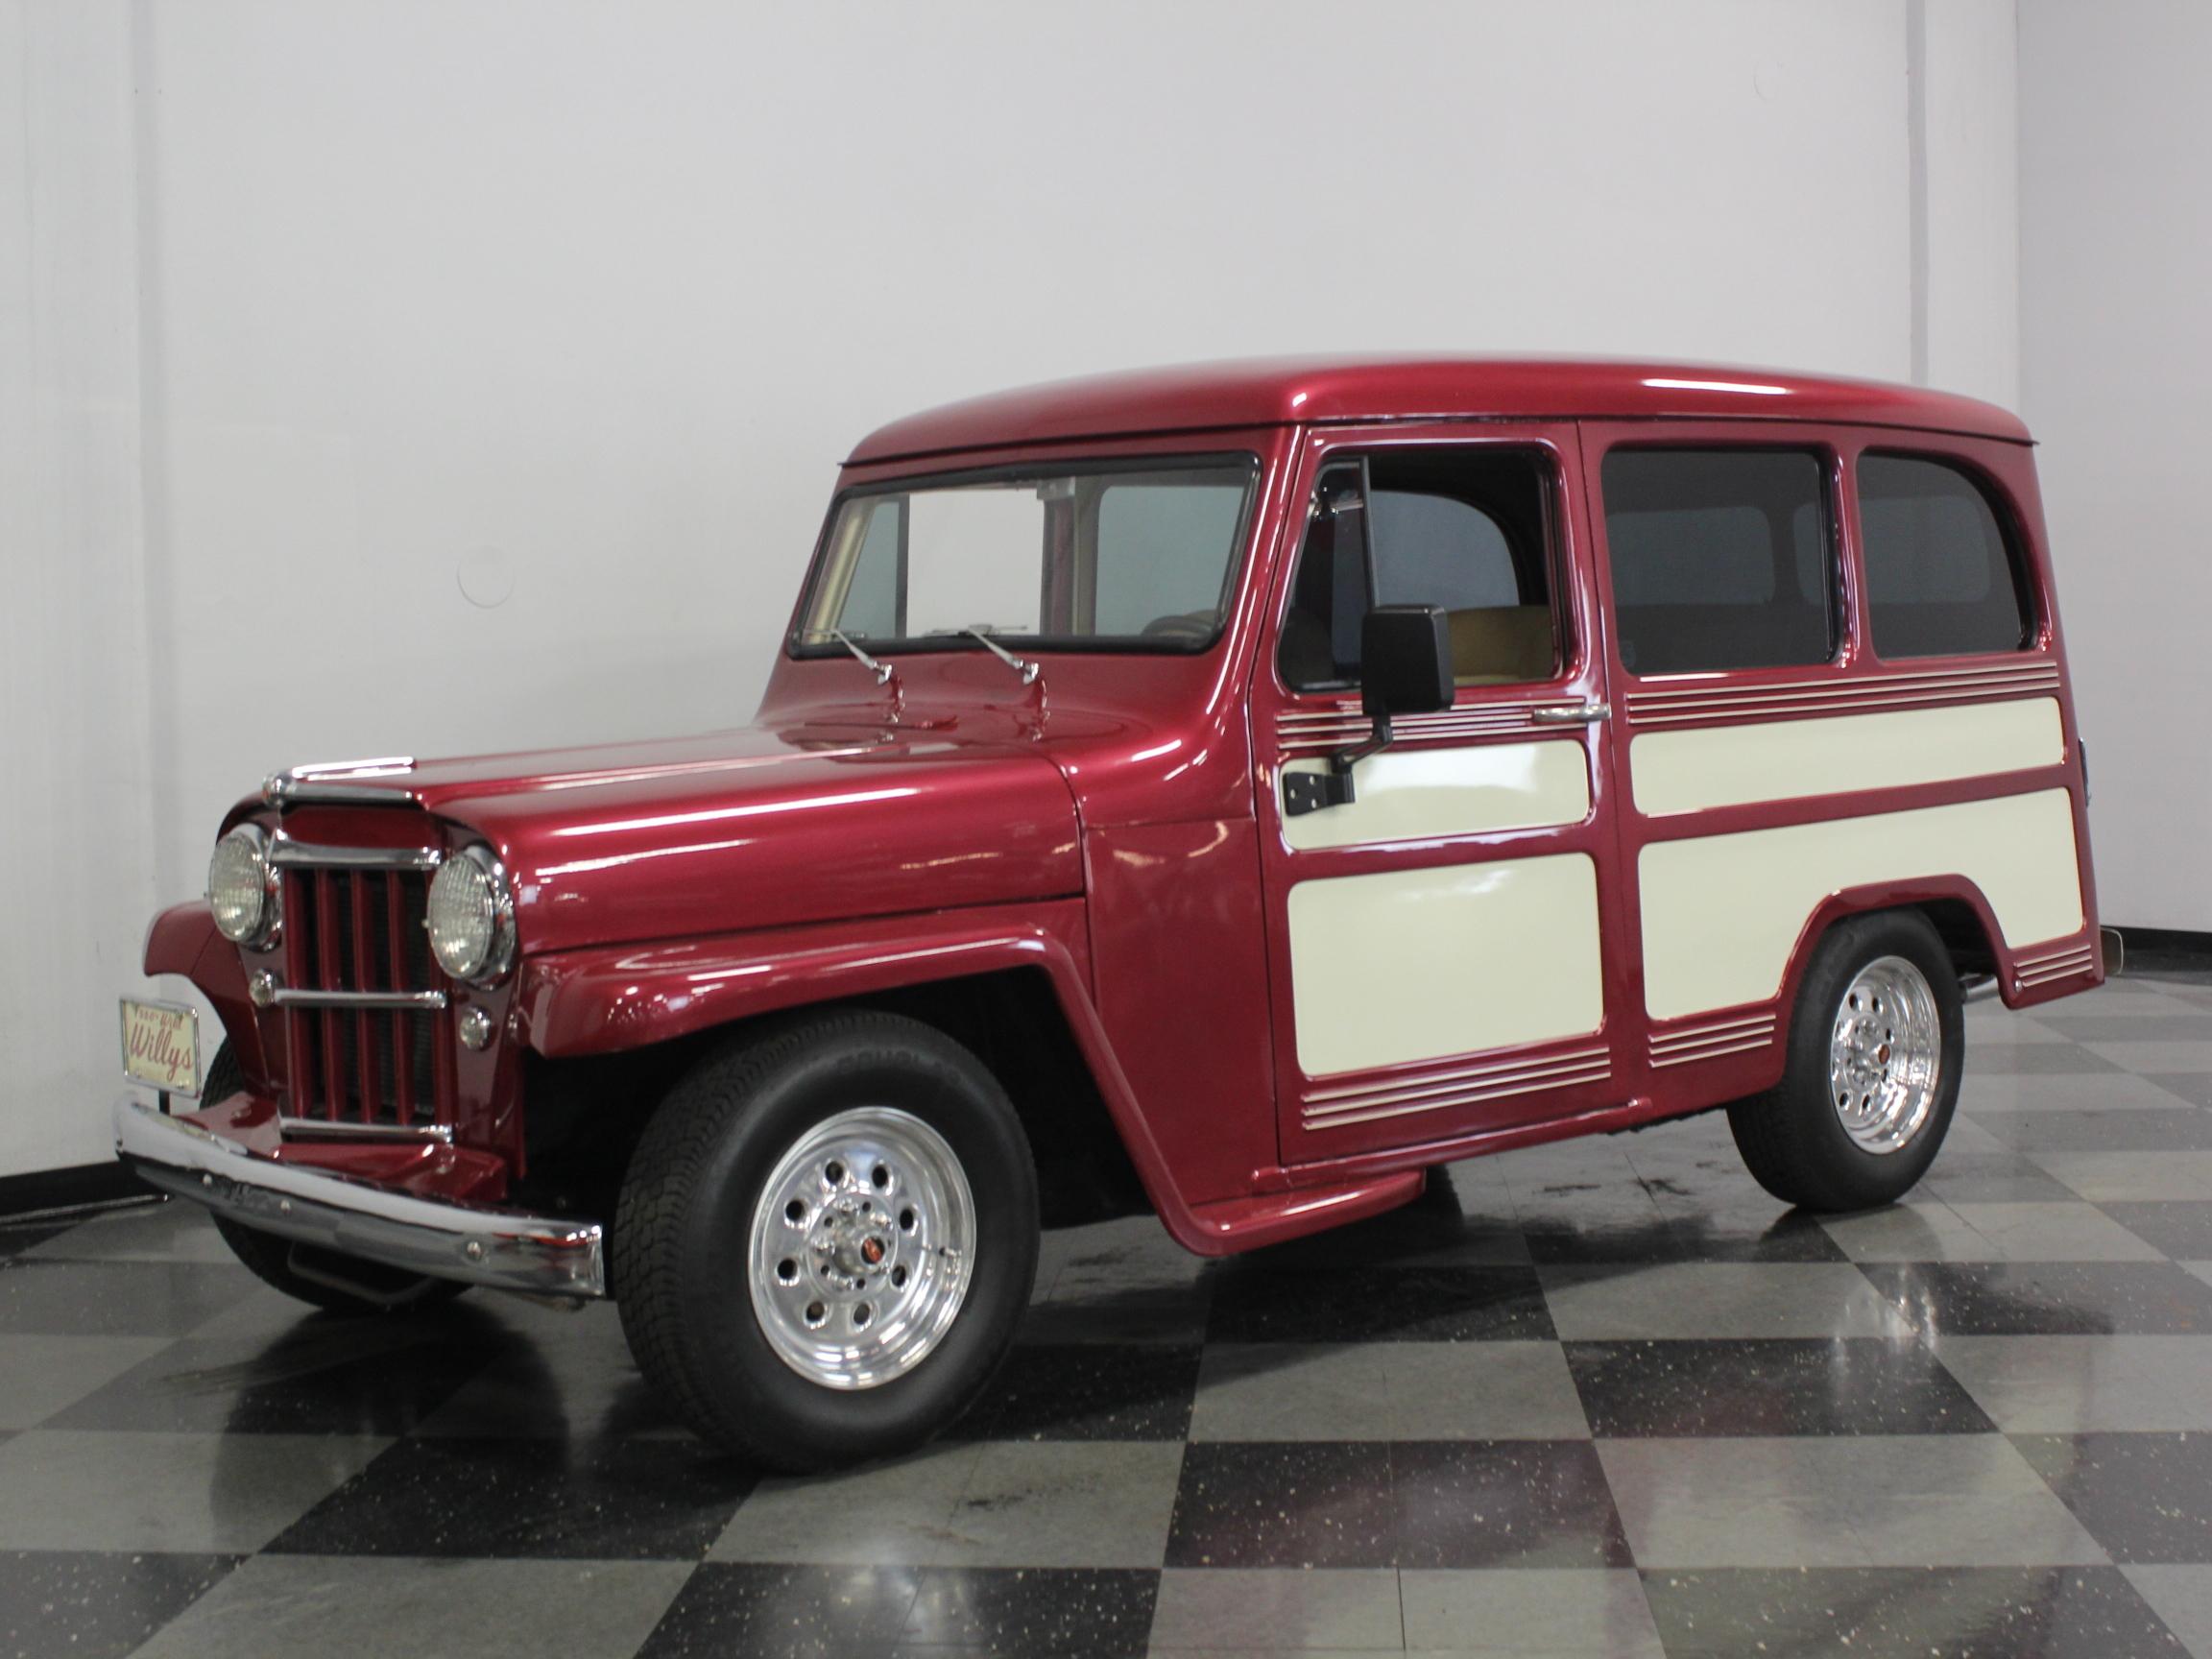 Nashville Jeep Dealer.2015 Jeep Wrangler Unlimited Rubicon ...